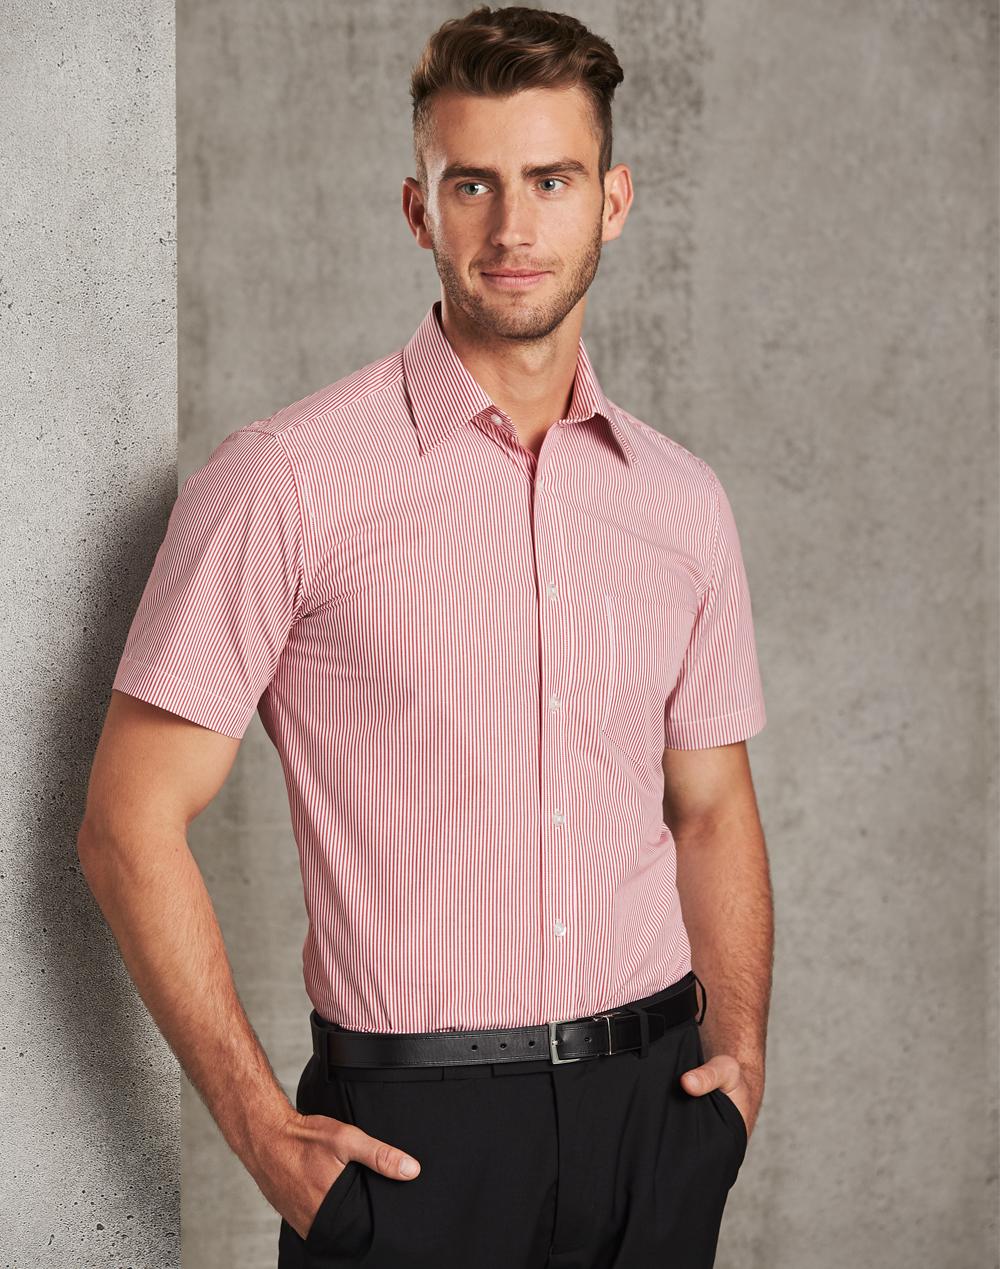 M7231 Men's Balance Stripe Short Sleeve Shirt